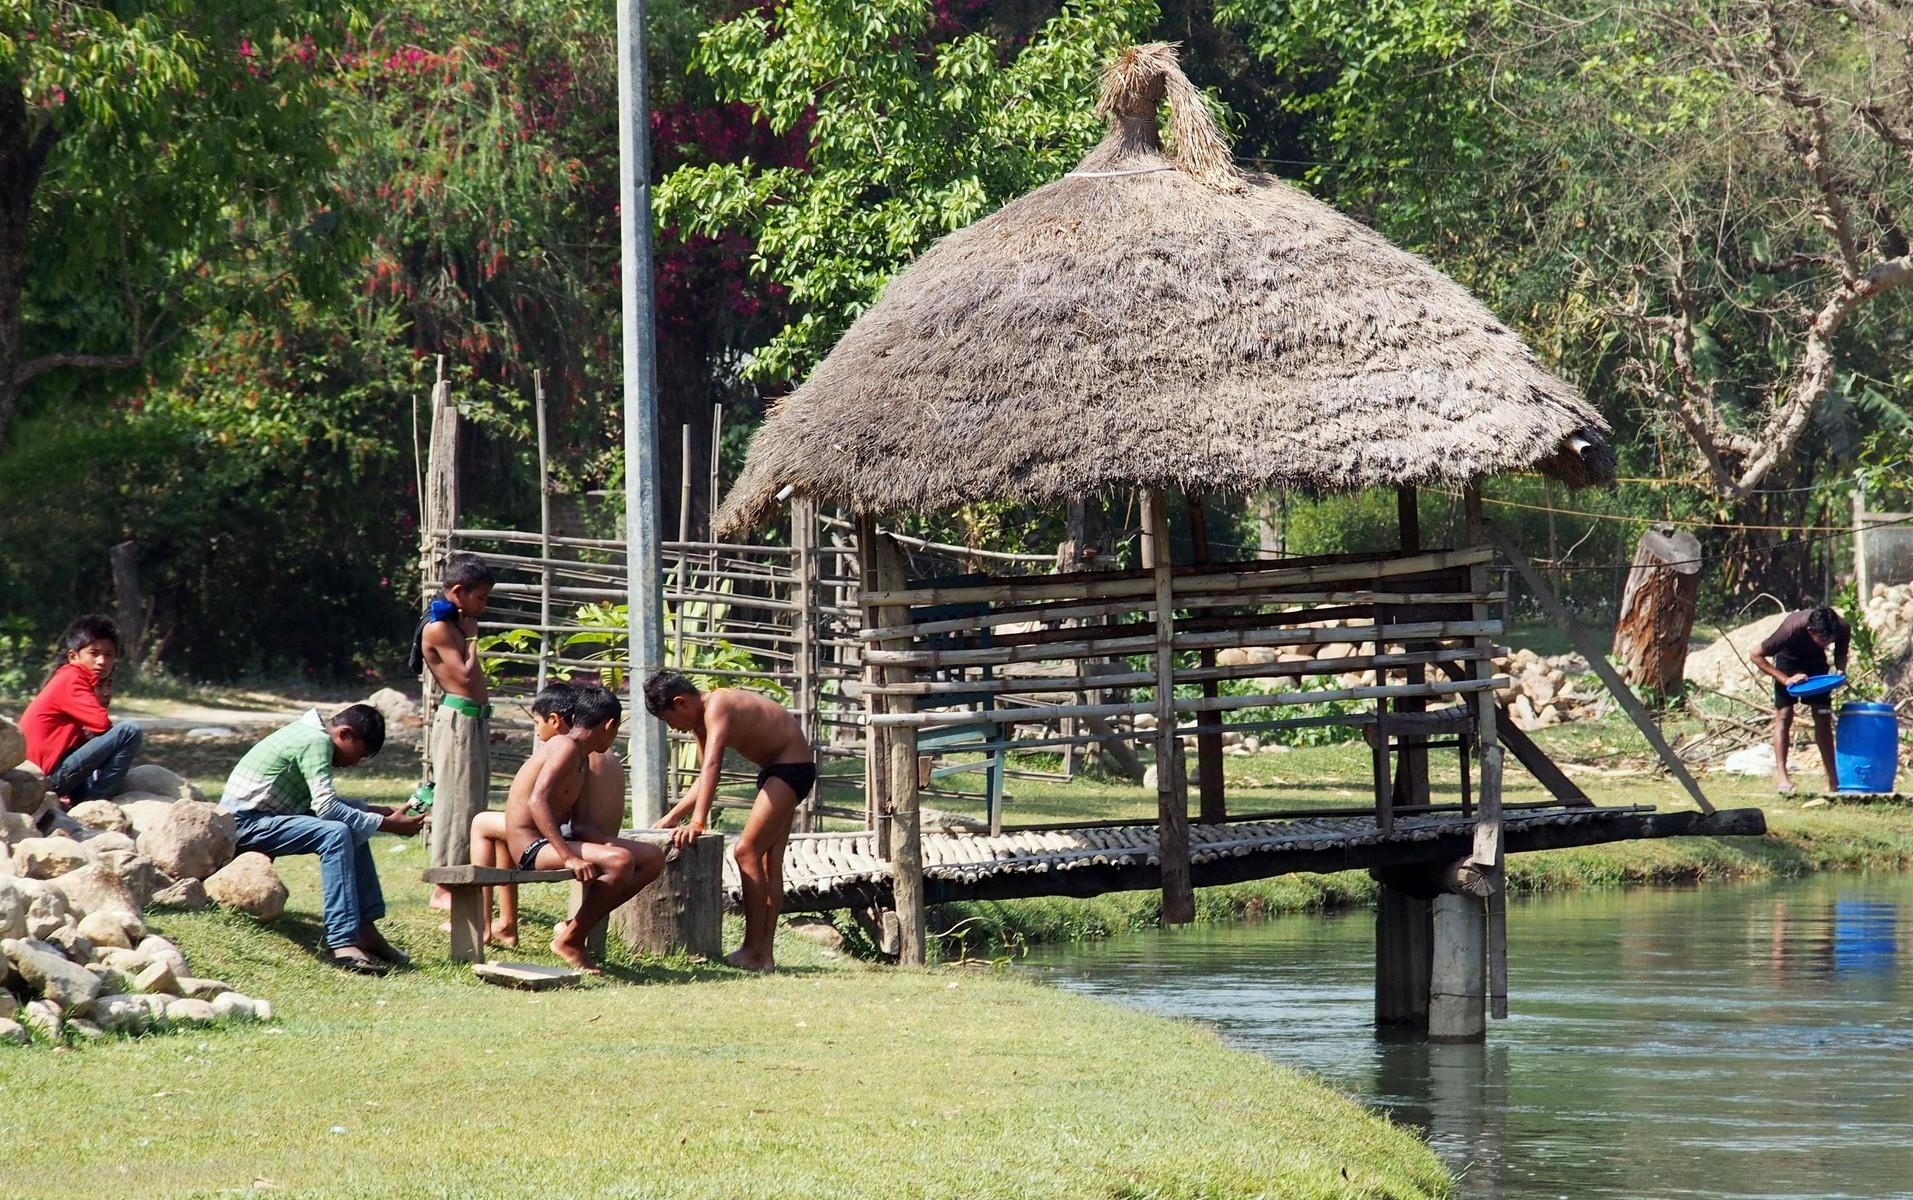 Baignade au village face au Racy Shade resort